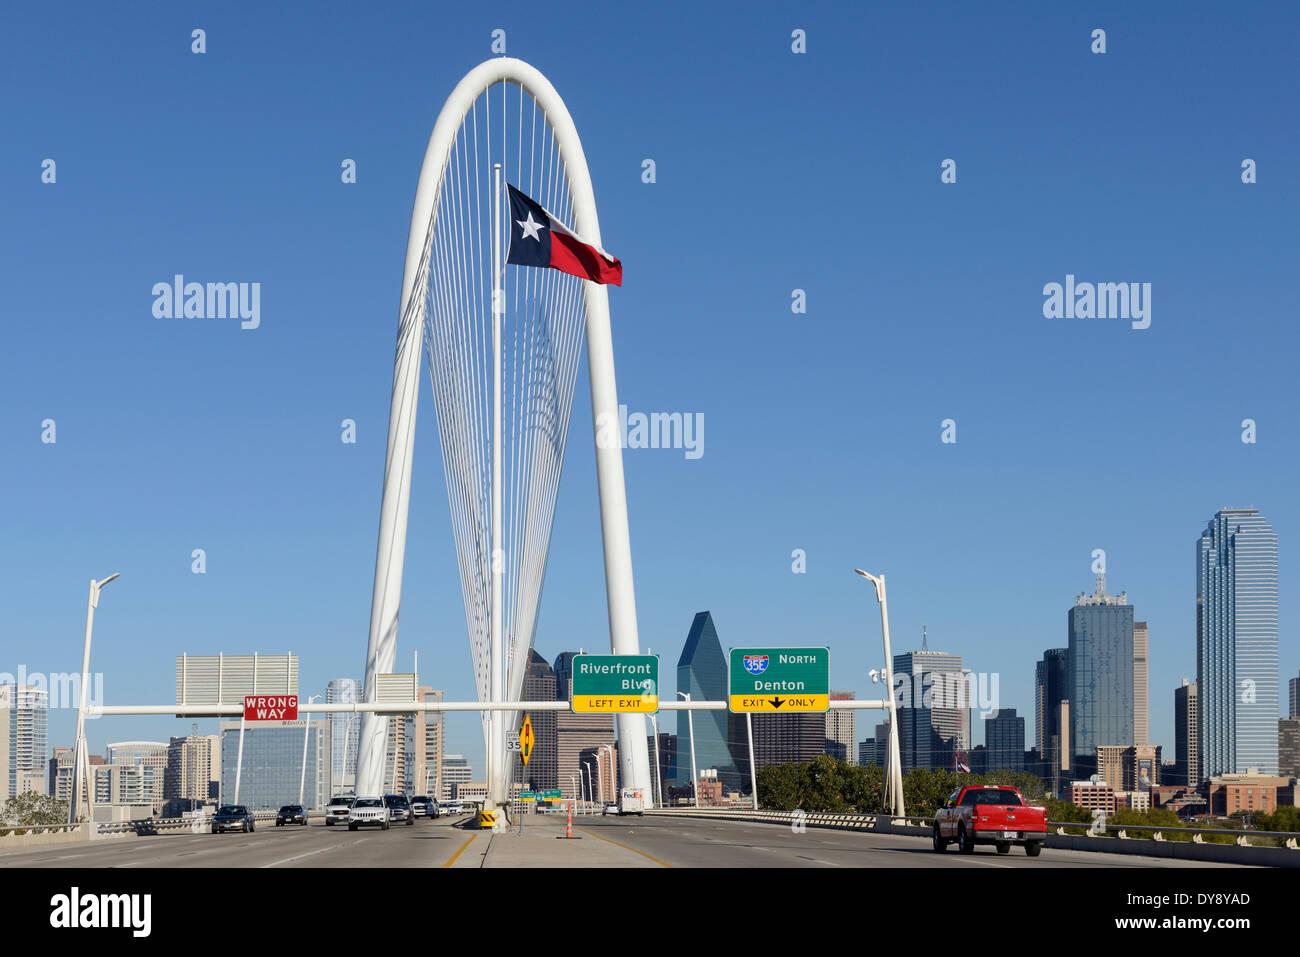 Dallas Stock Photos  Dallas Stock Images  Alamy